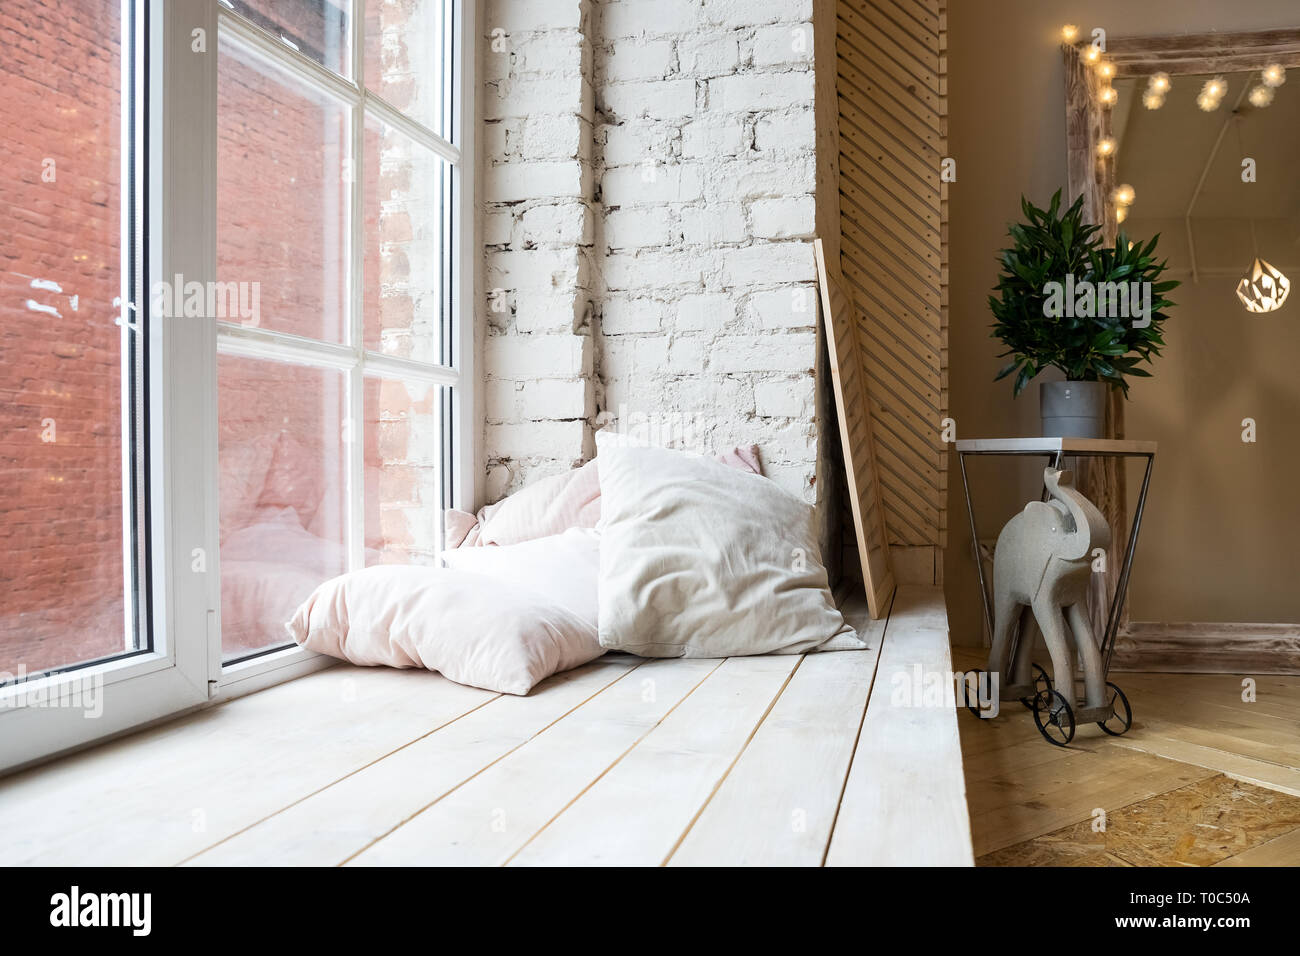 Helles Studio Interieur Mit Grossen Fenster Hohe Decken